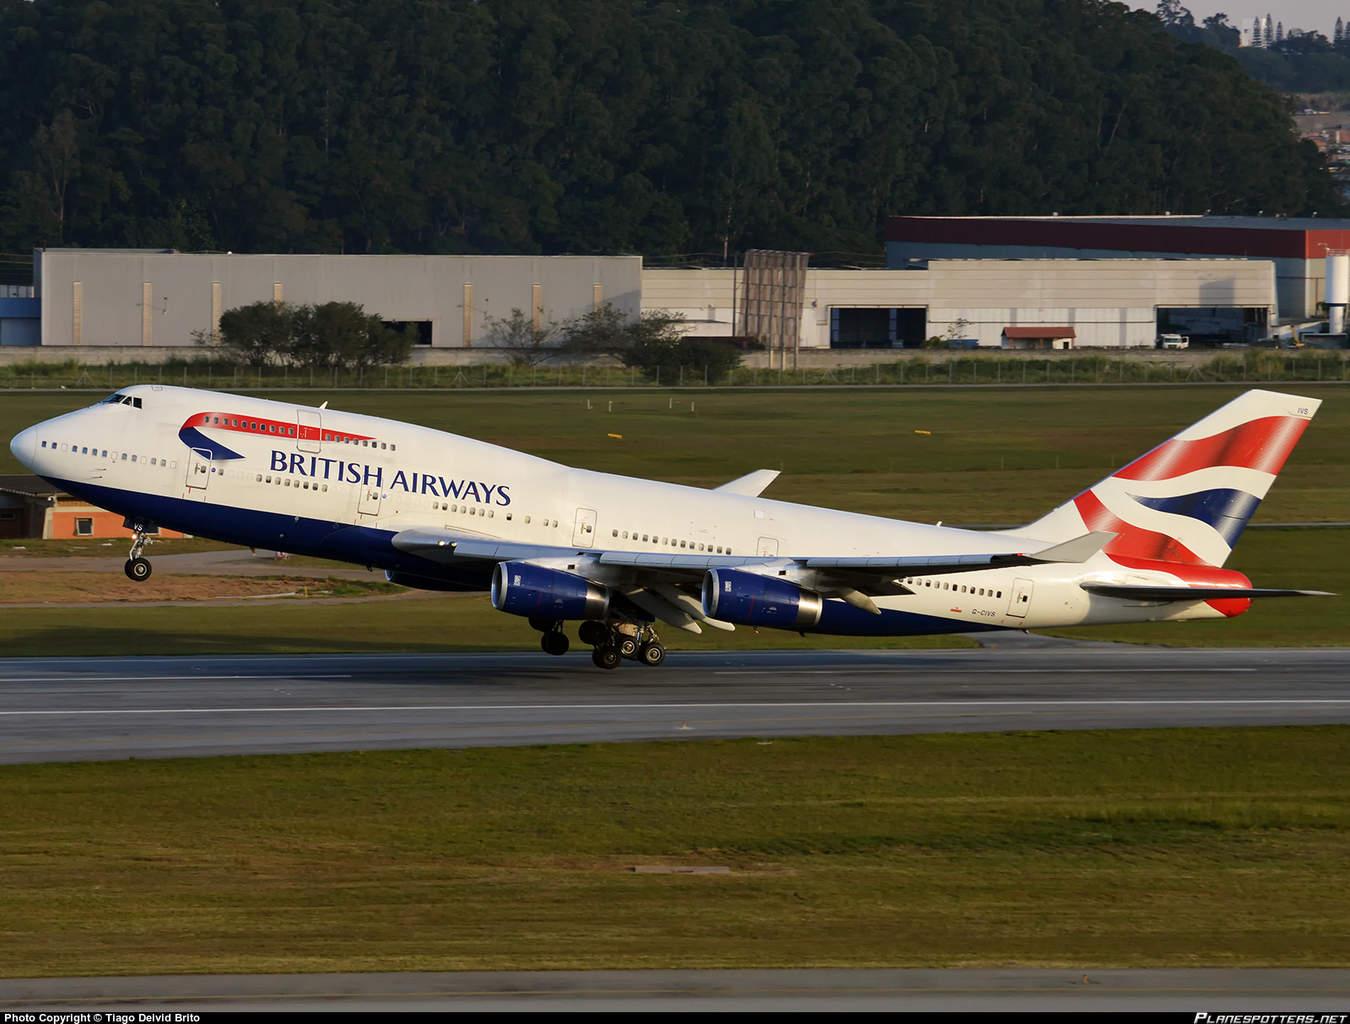 British Airways 747-436 suffers damage at JFK